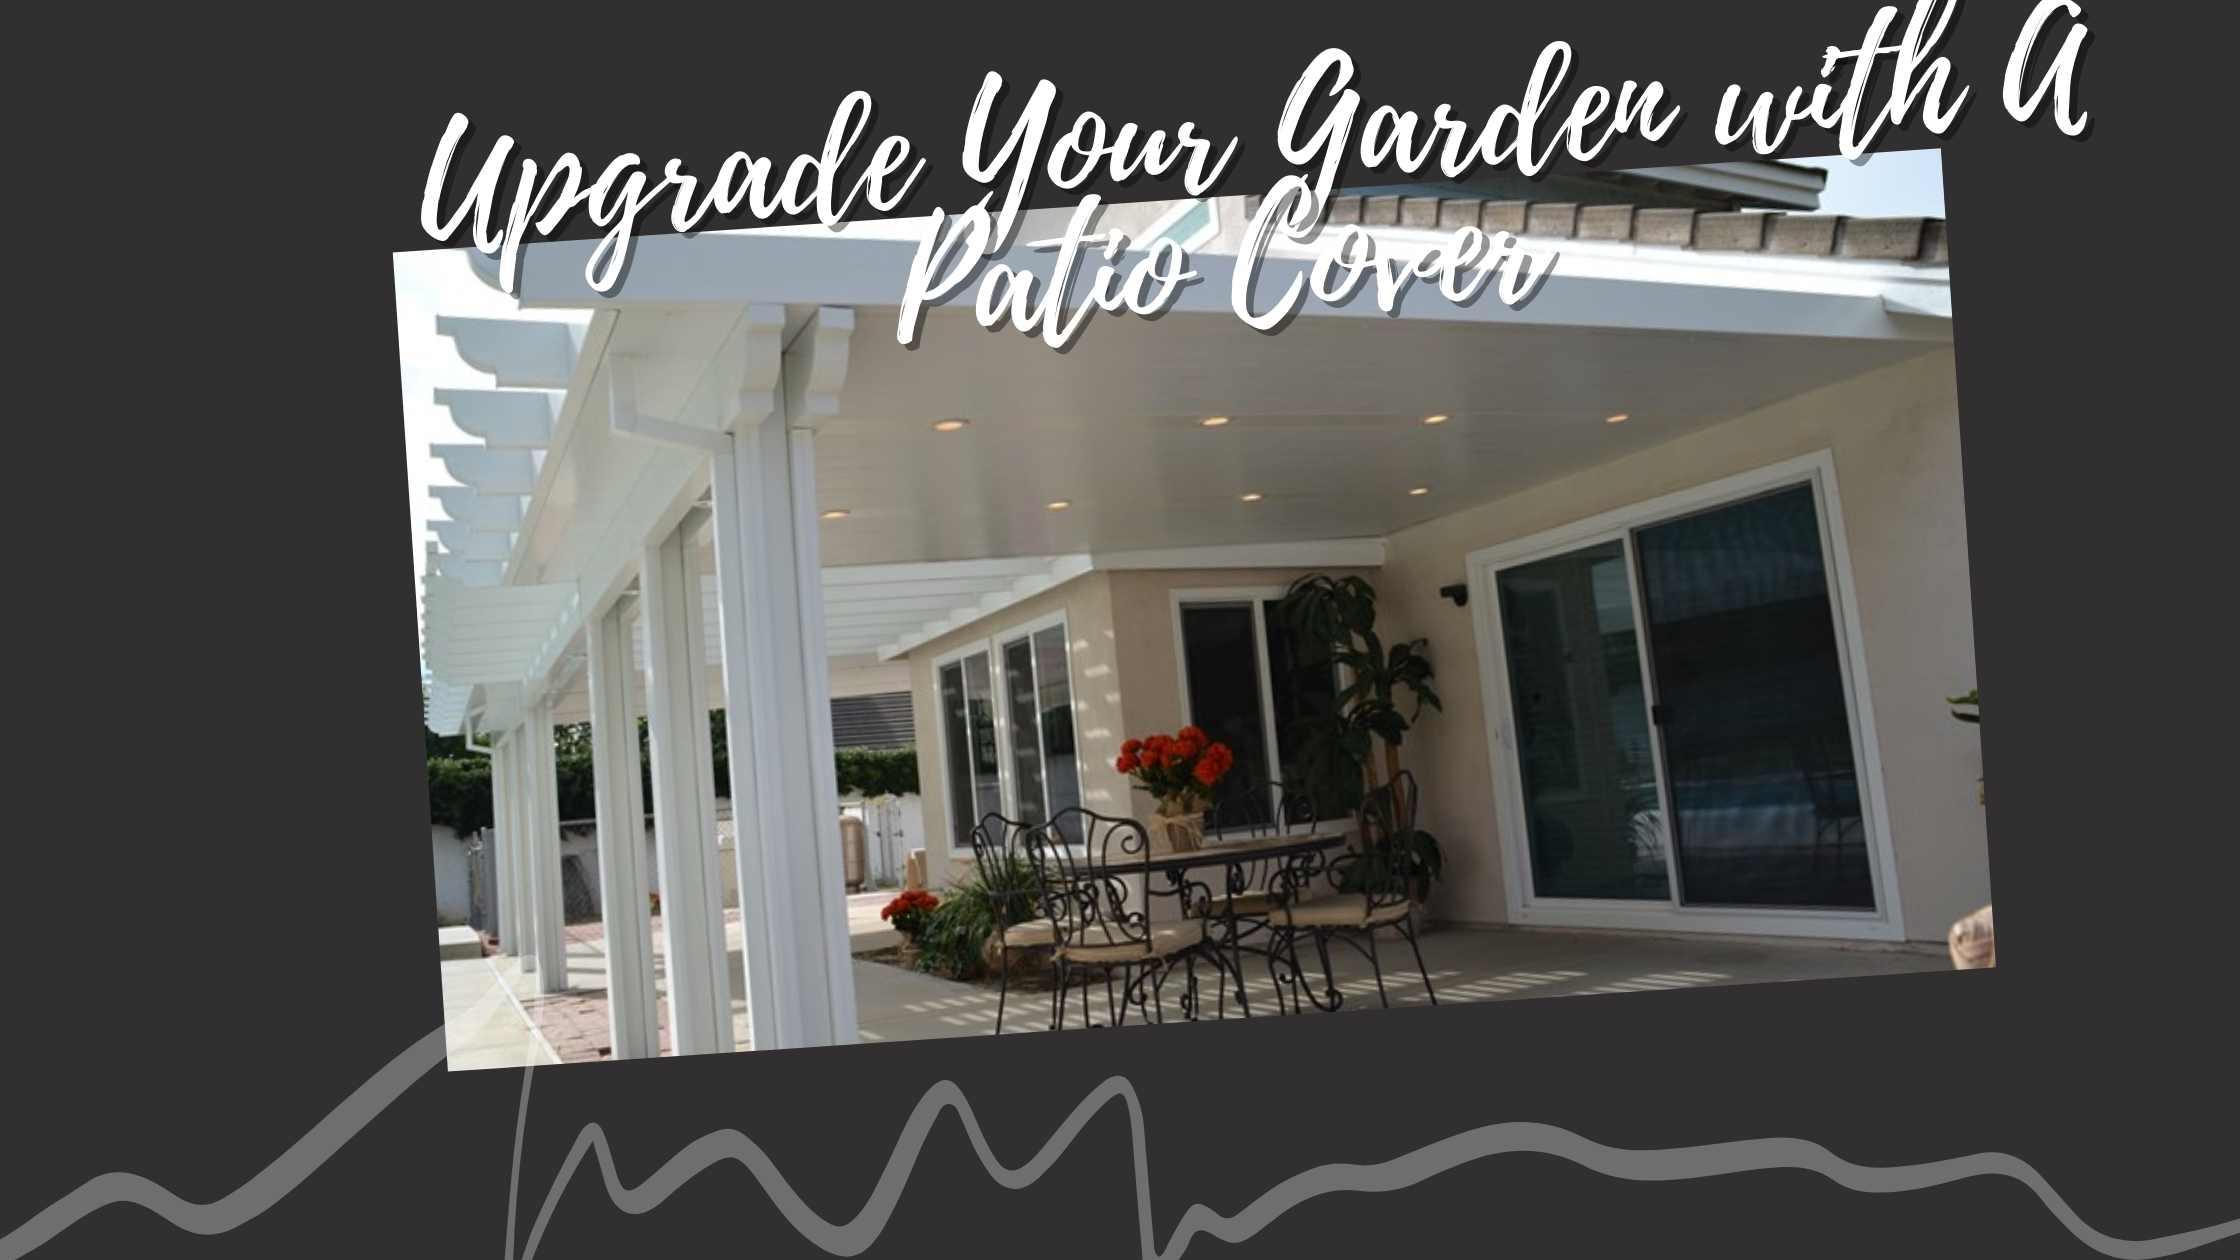 Upgrade Your Garden with A Patio Cover